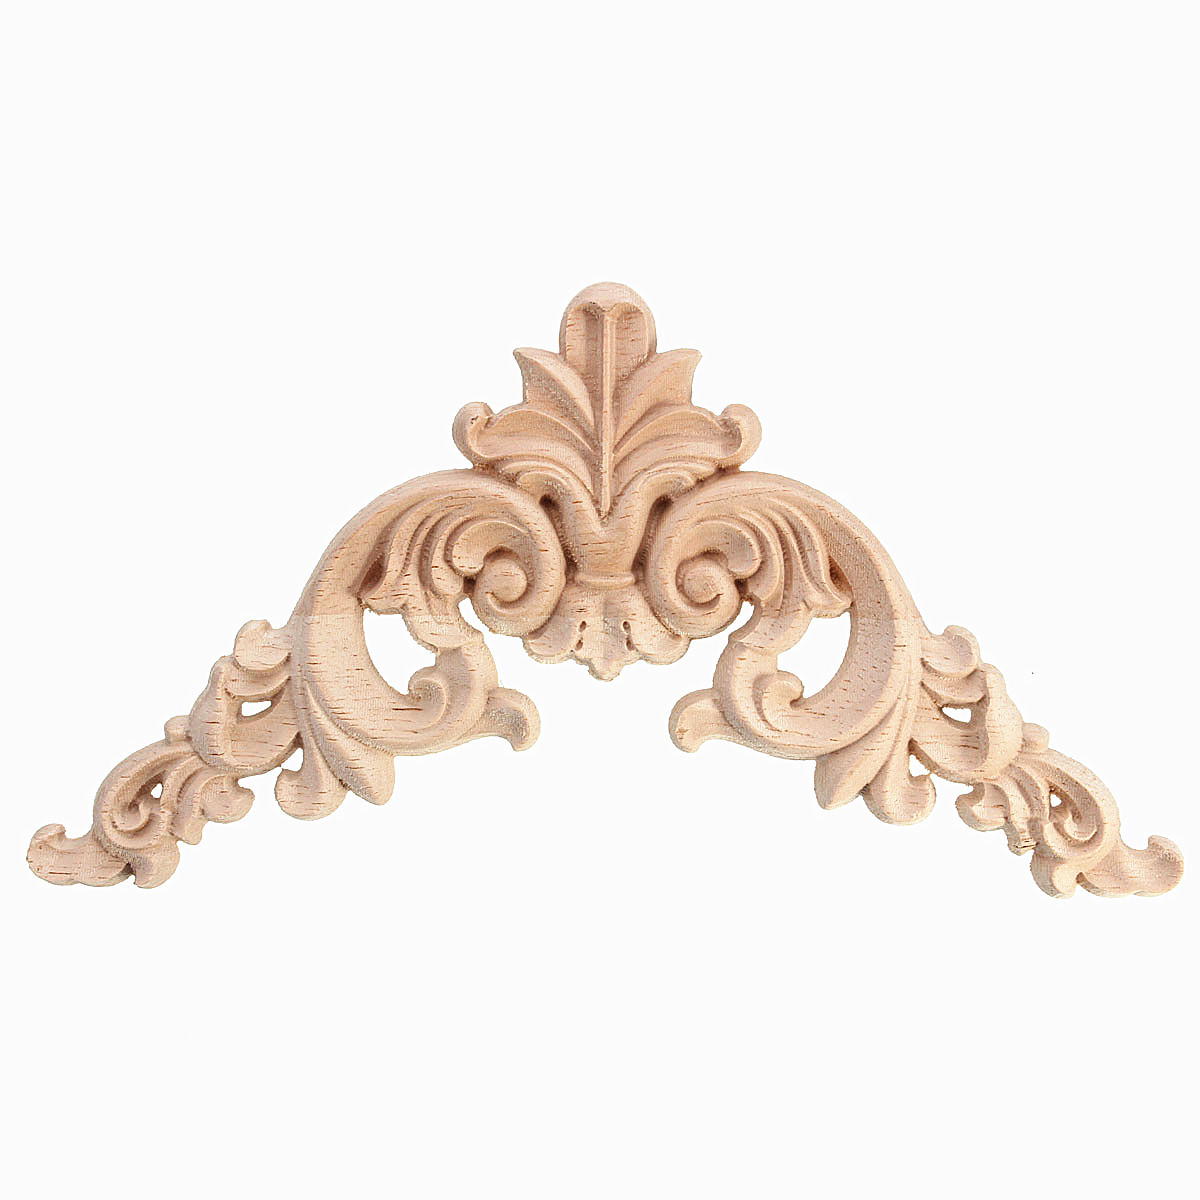 Unpainted Wood Oak Carved Corner Onlay Applique Furniture Home Decor Ebay